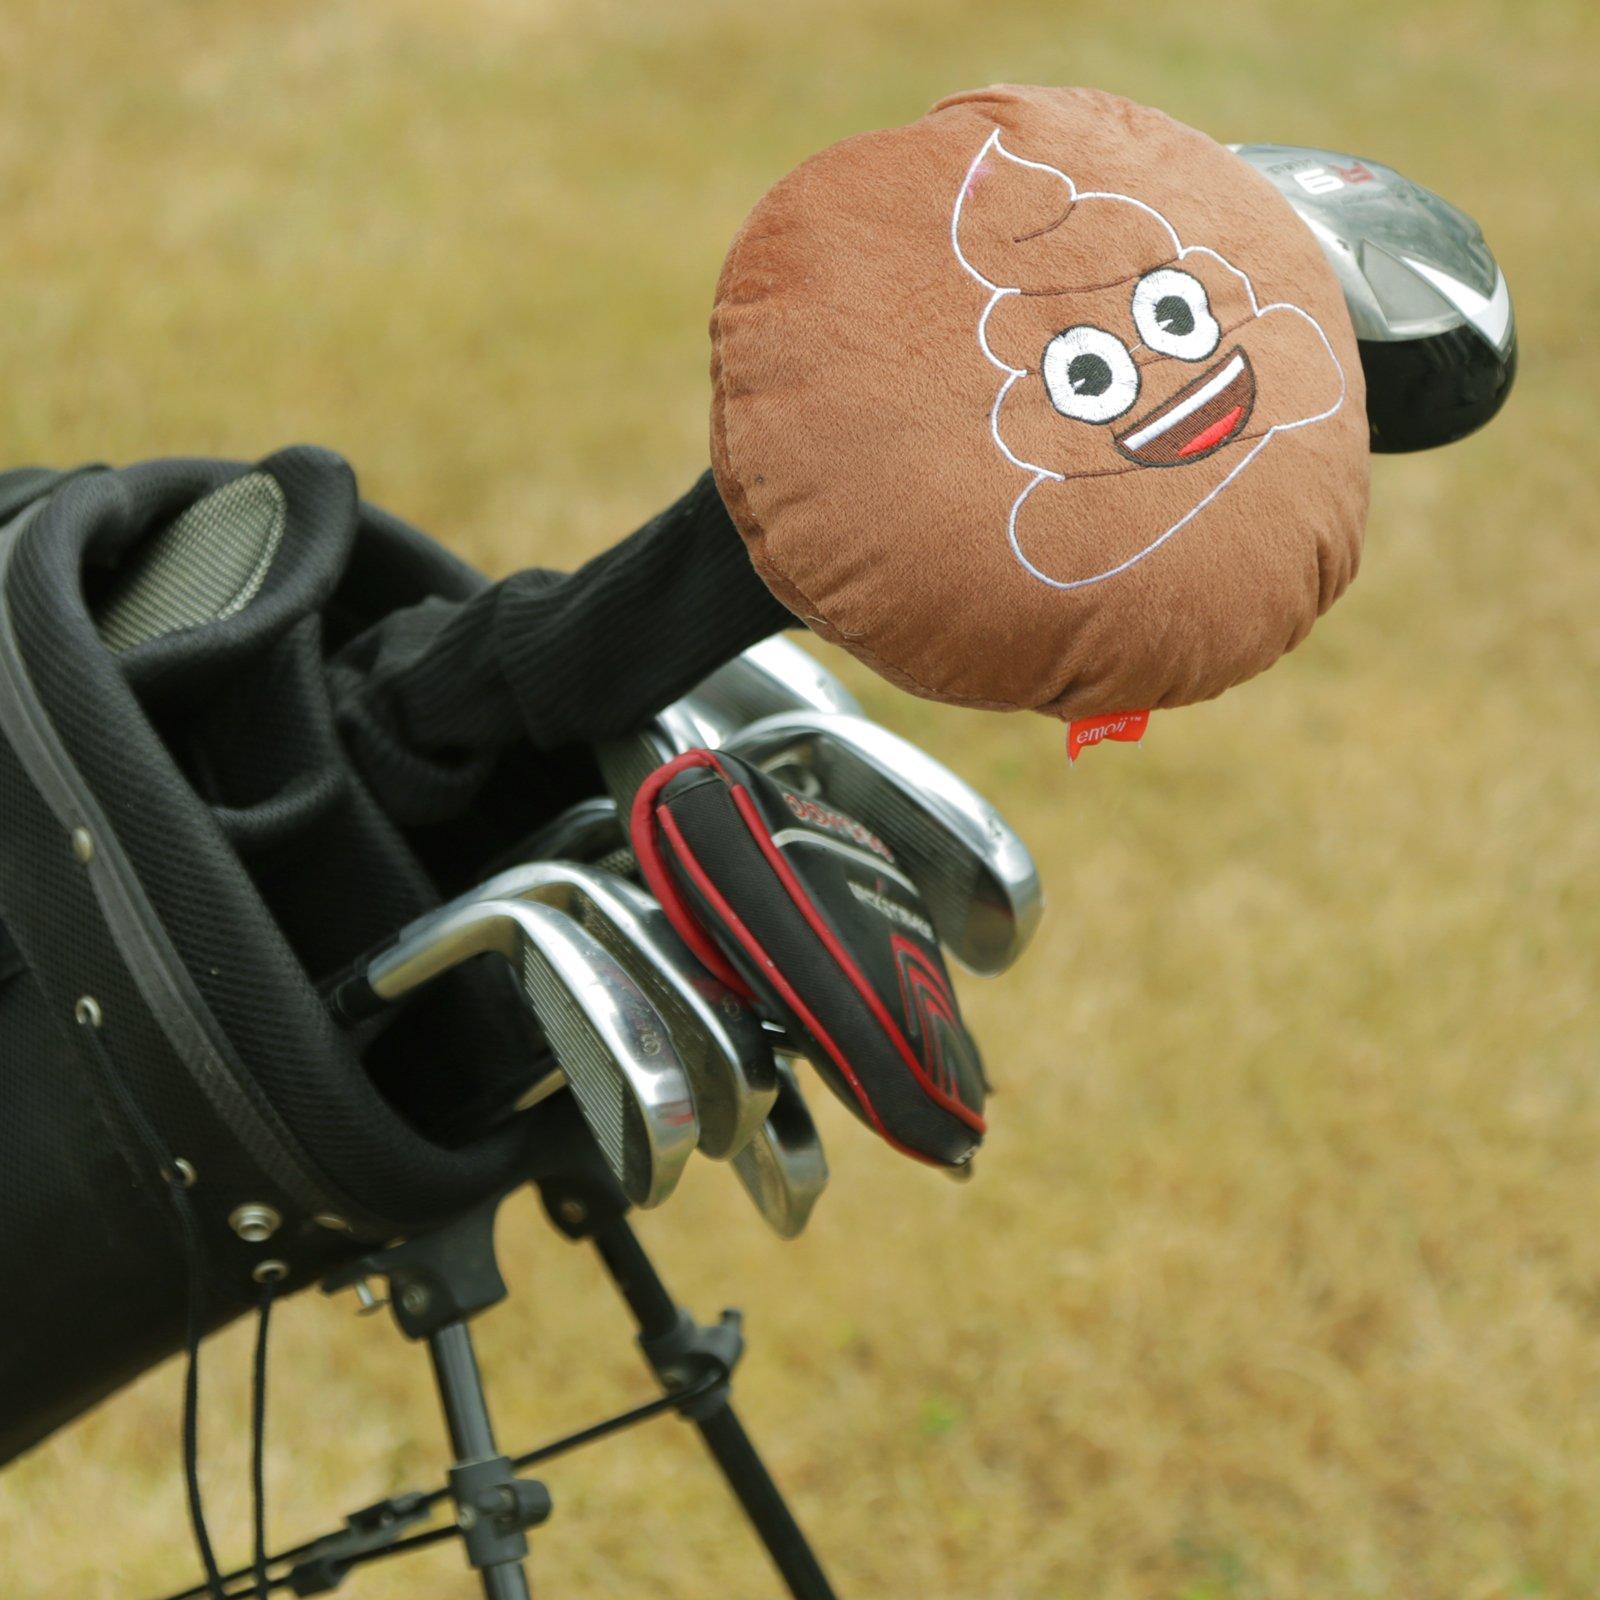 Emoji 460cc Golf Club Driver Head Cover Brown Smiley Poop